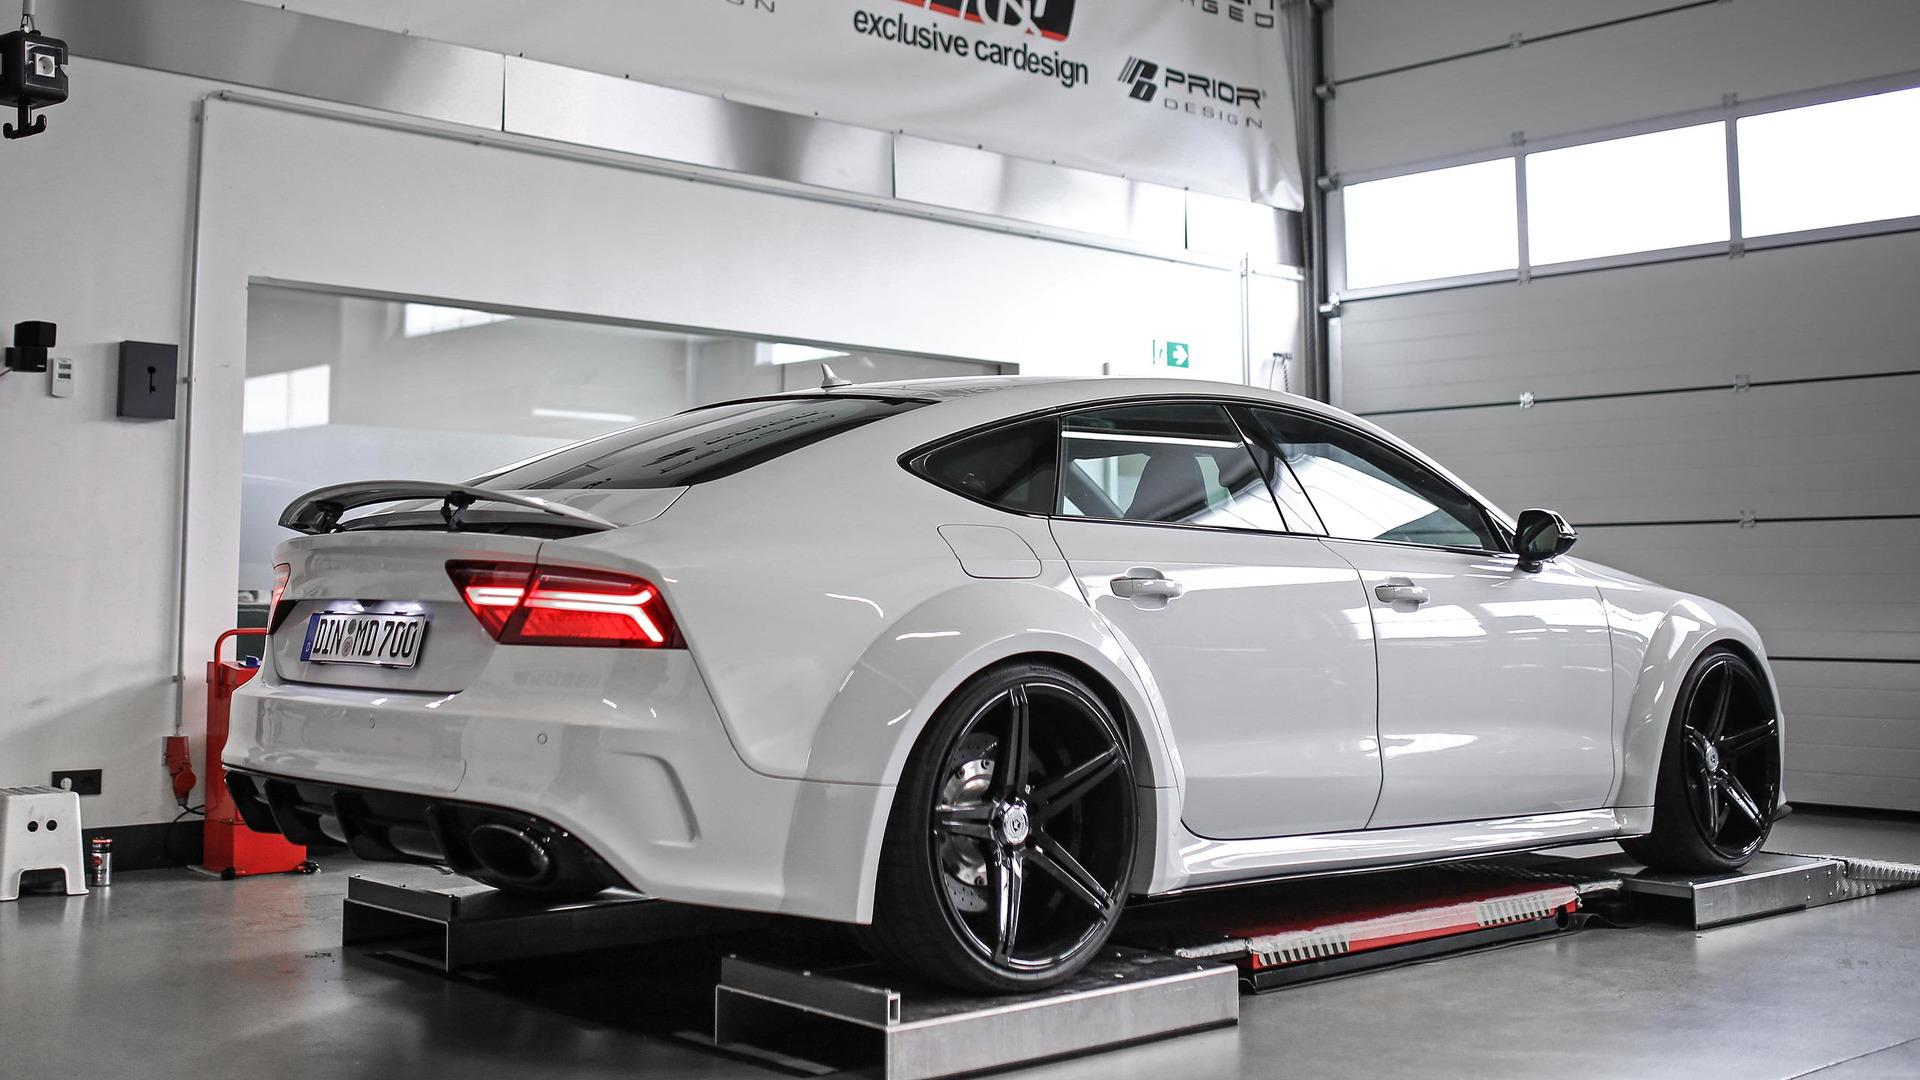 M&D Exclusive Car Design boosts Audi S7 to 690 hp Paul Tan ...